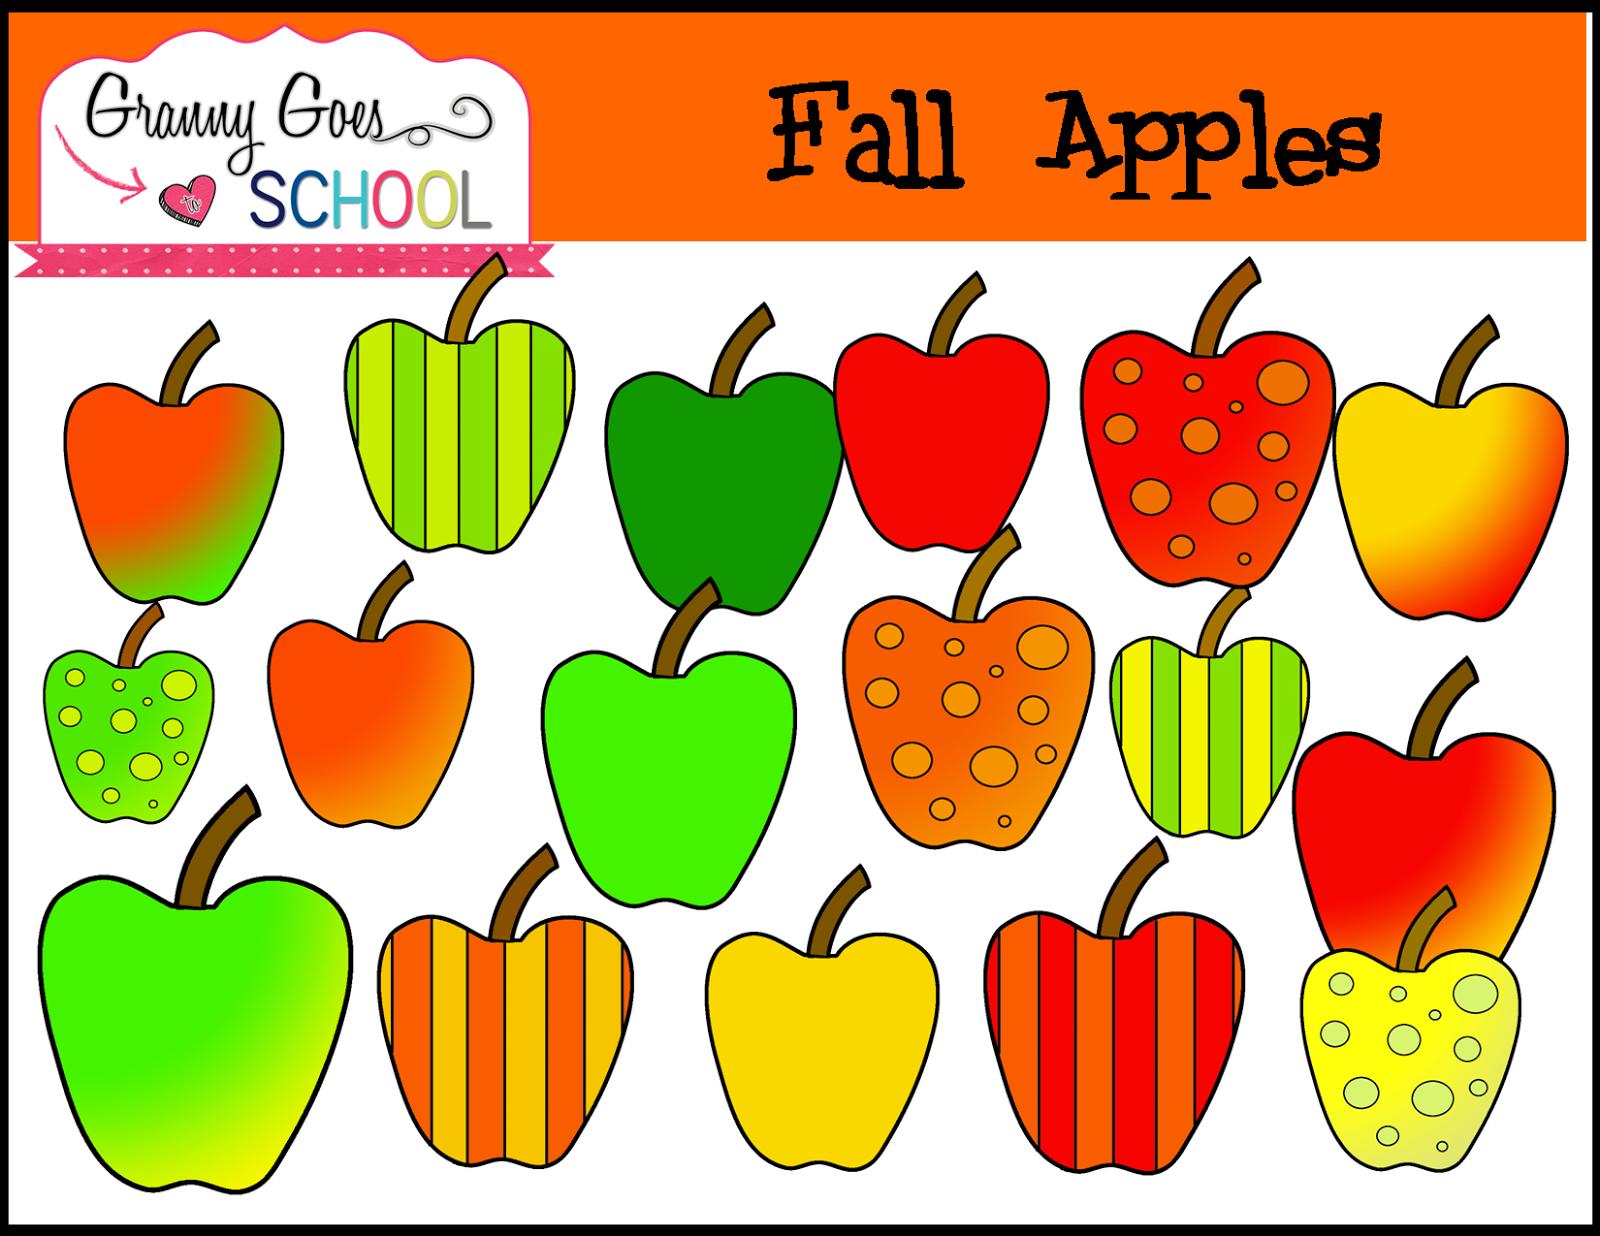 http://1.bp.blogspot.com/-NyO6B45Fv2Q/VBmrY5KB_0I/AAAAAAAAN1Q/-p6tJXBPpUU/s1600/fall.apples.cover.page.png